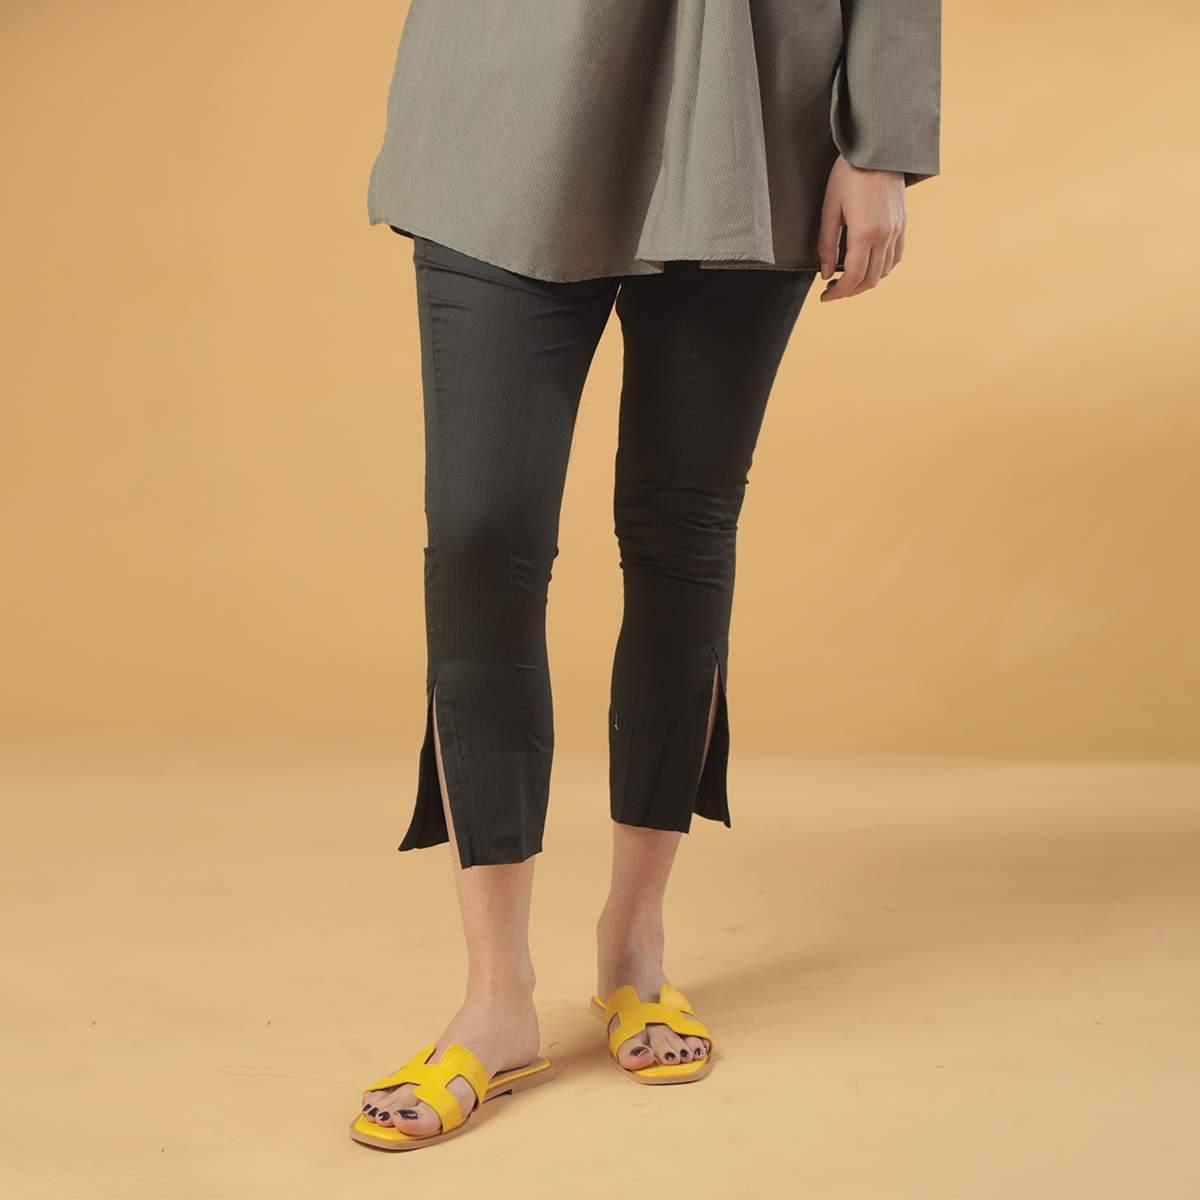 Maahru Black Capri Pants - P11